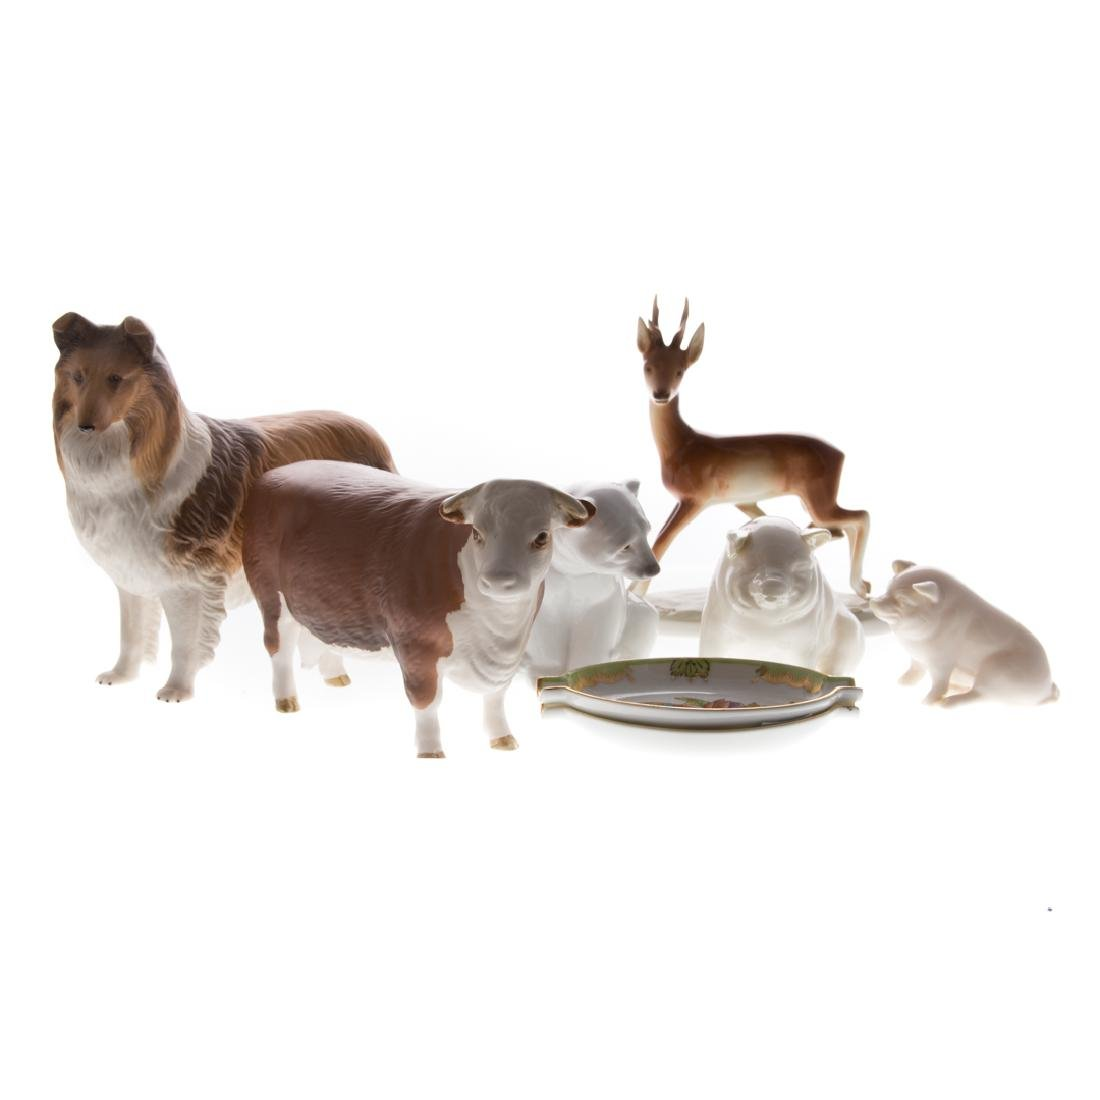 Six English and continental ceramic animals